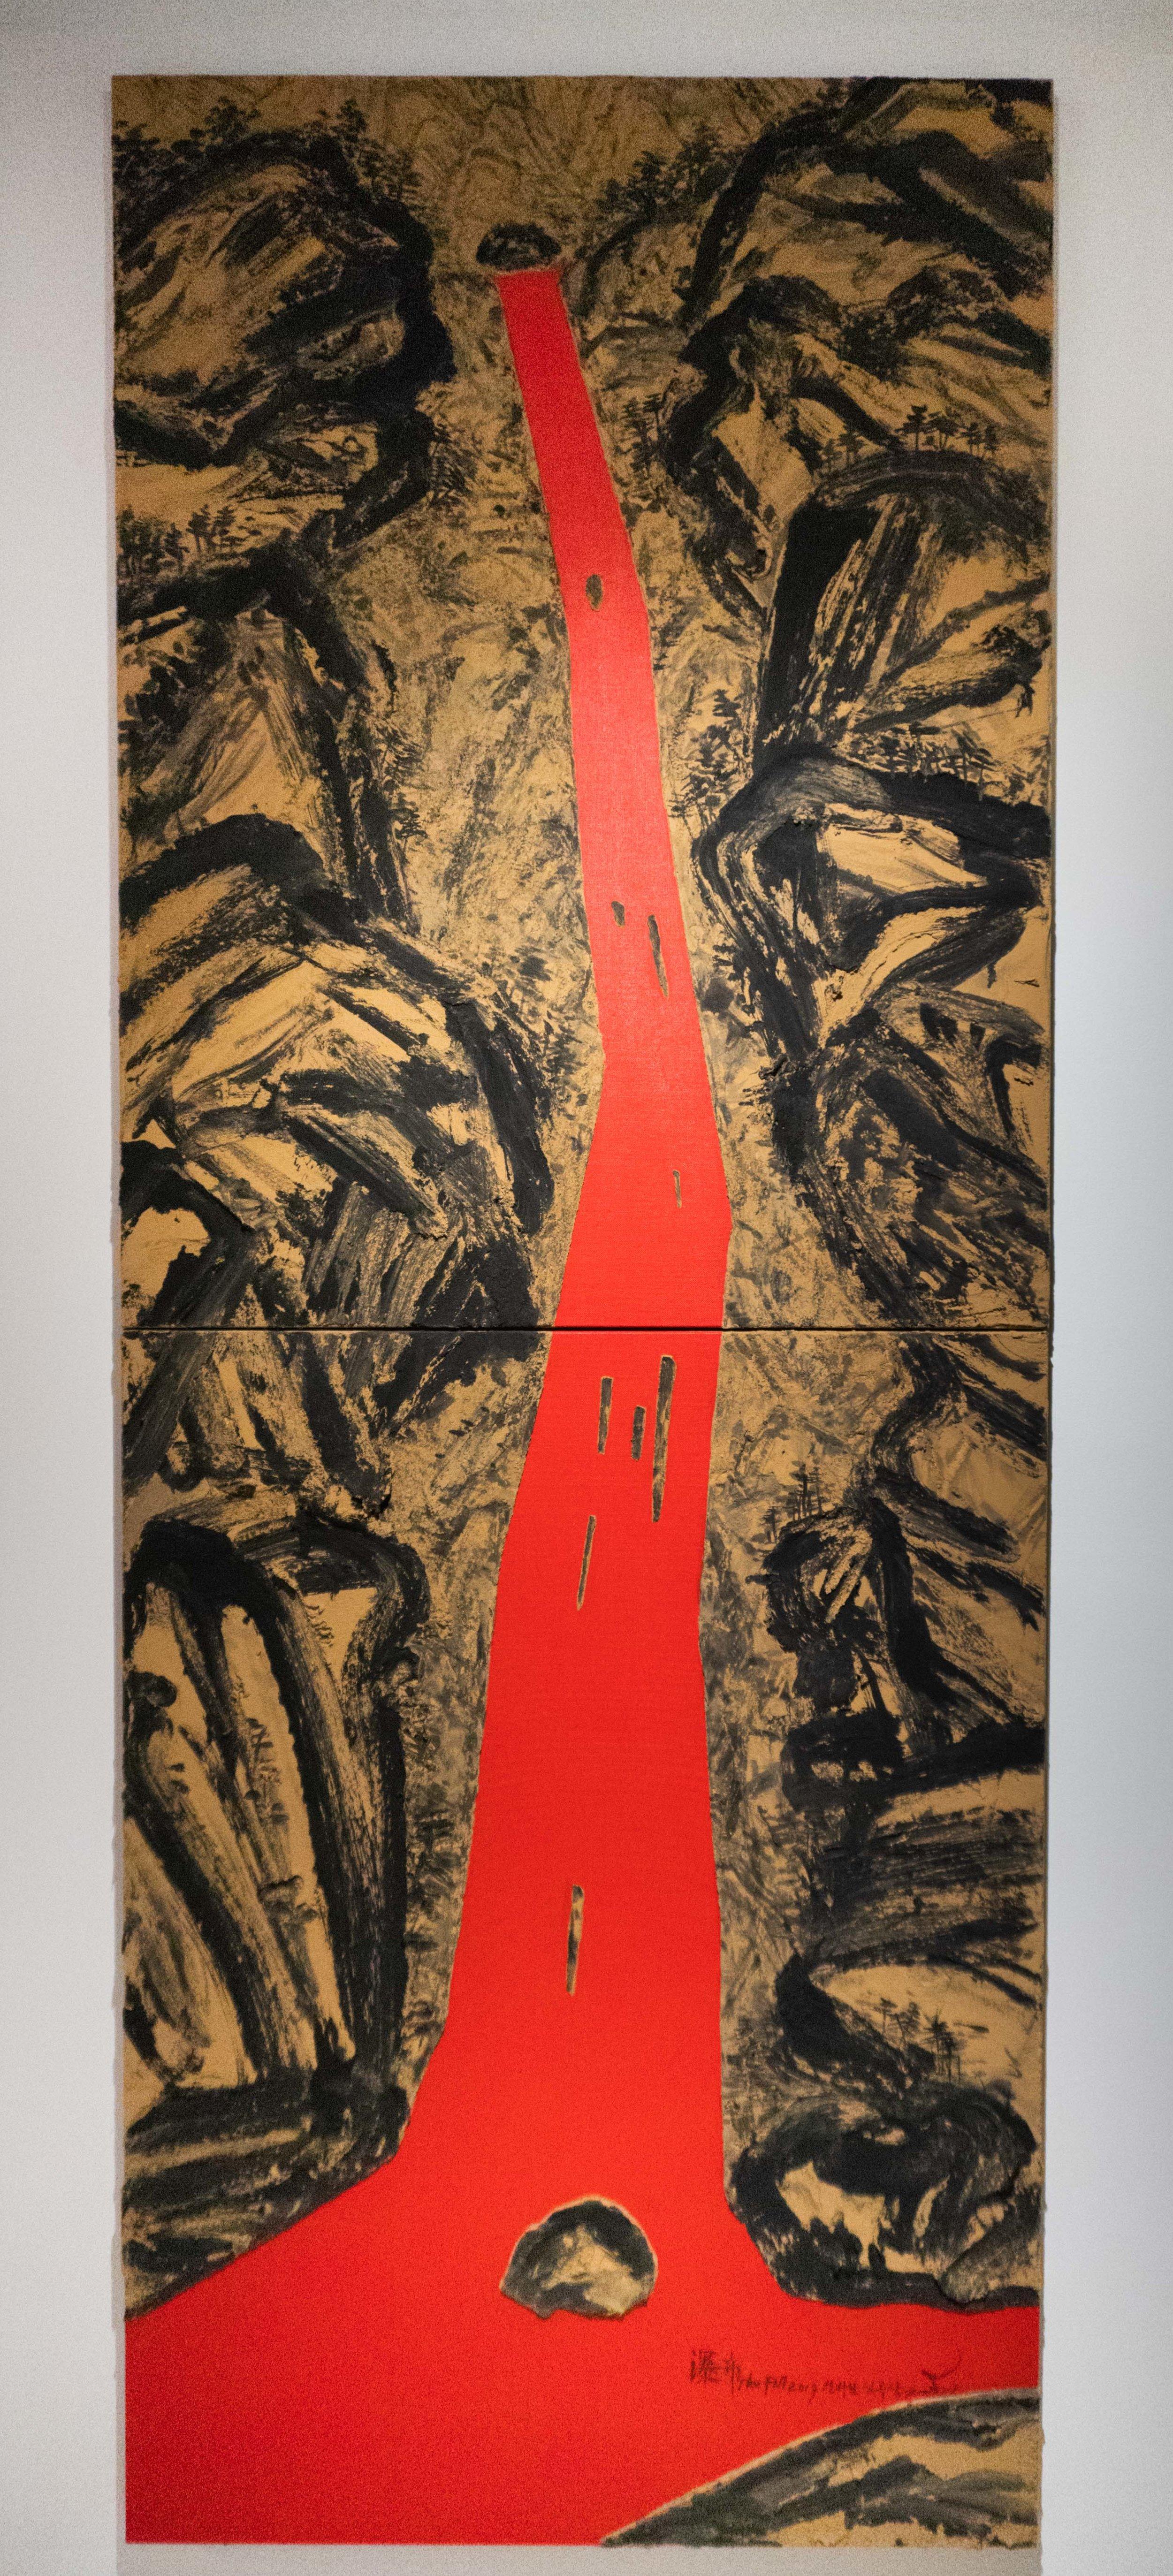 Lim Oksang 임옥상 b.1950   Falling Water폭포 2019 Ink and soil 33 x 88 in